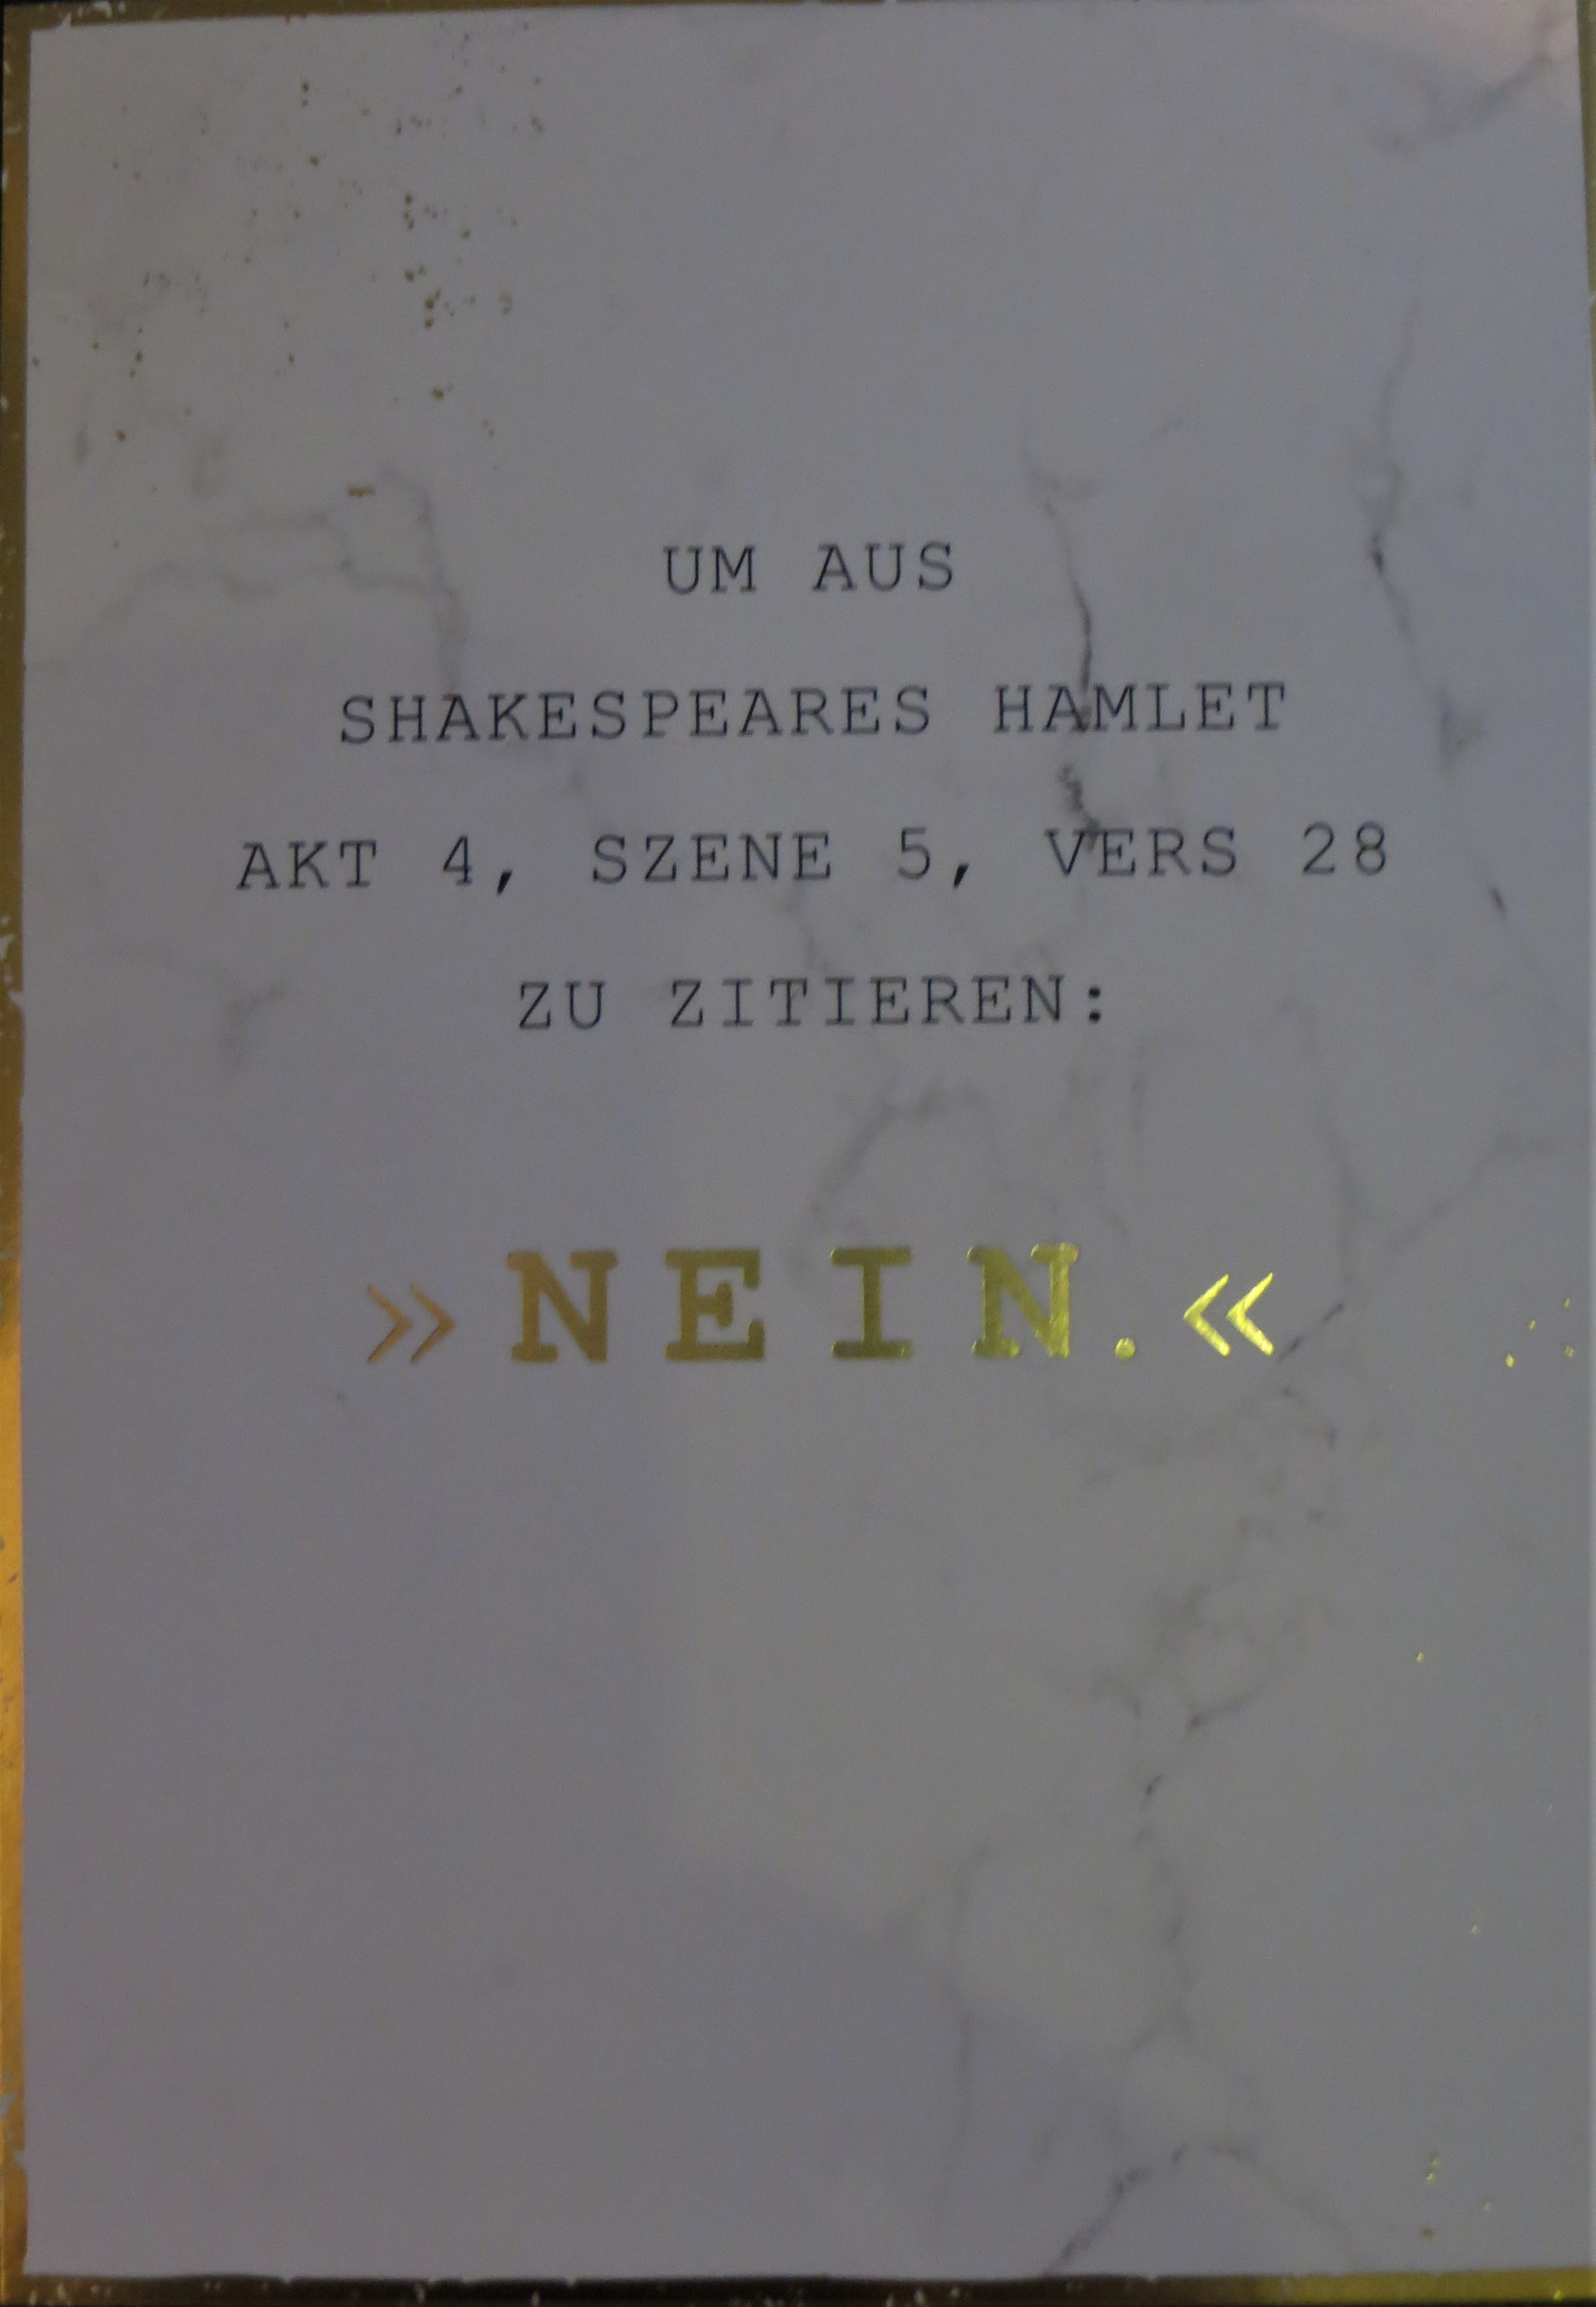 Nützlichgrusskarten - Postkarte Um aus Shakespeares Hamlet Akt 4 Szene 5 Vers 28 zu zitieren NEIN. VintageArt - Onlineshop Tante Emmer